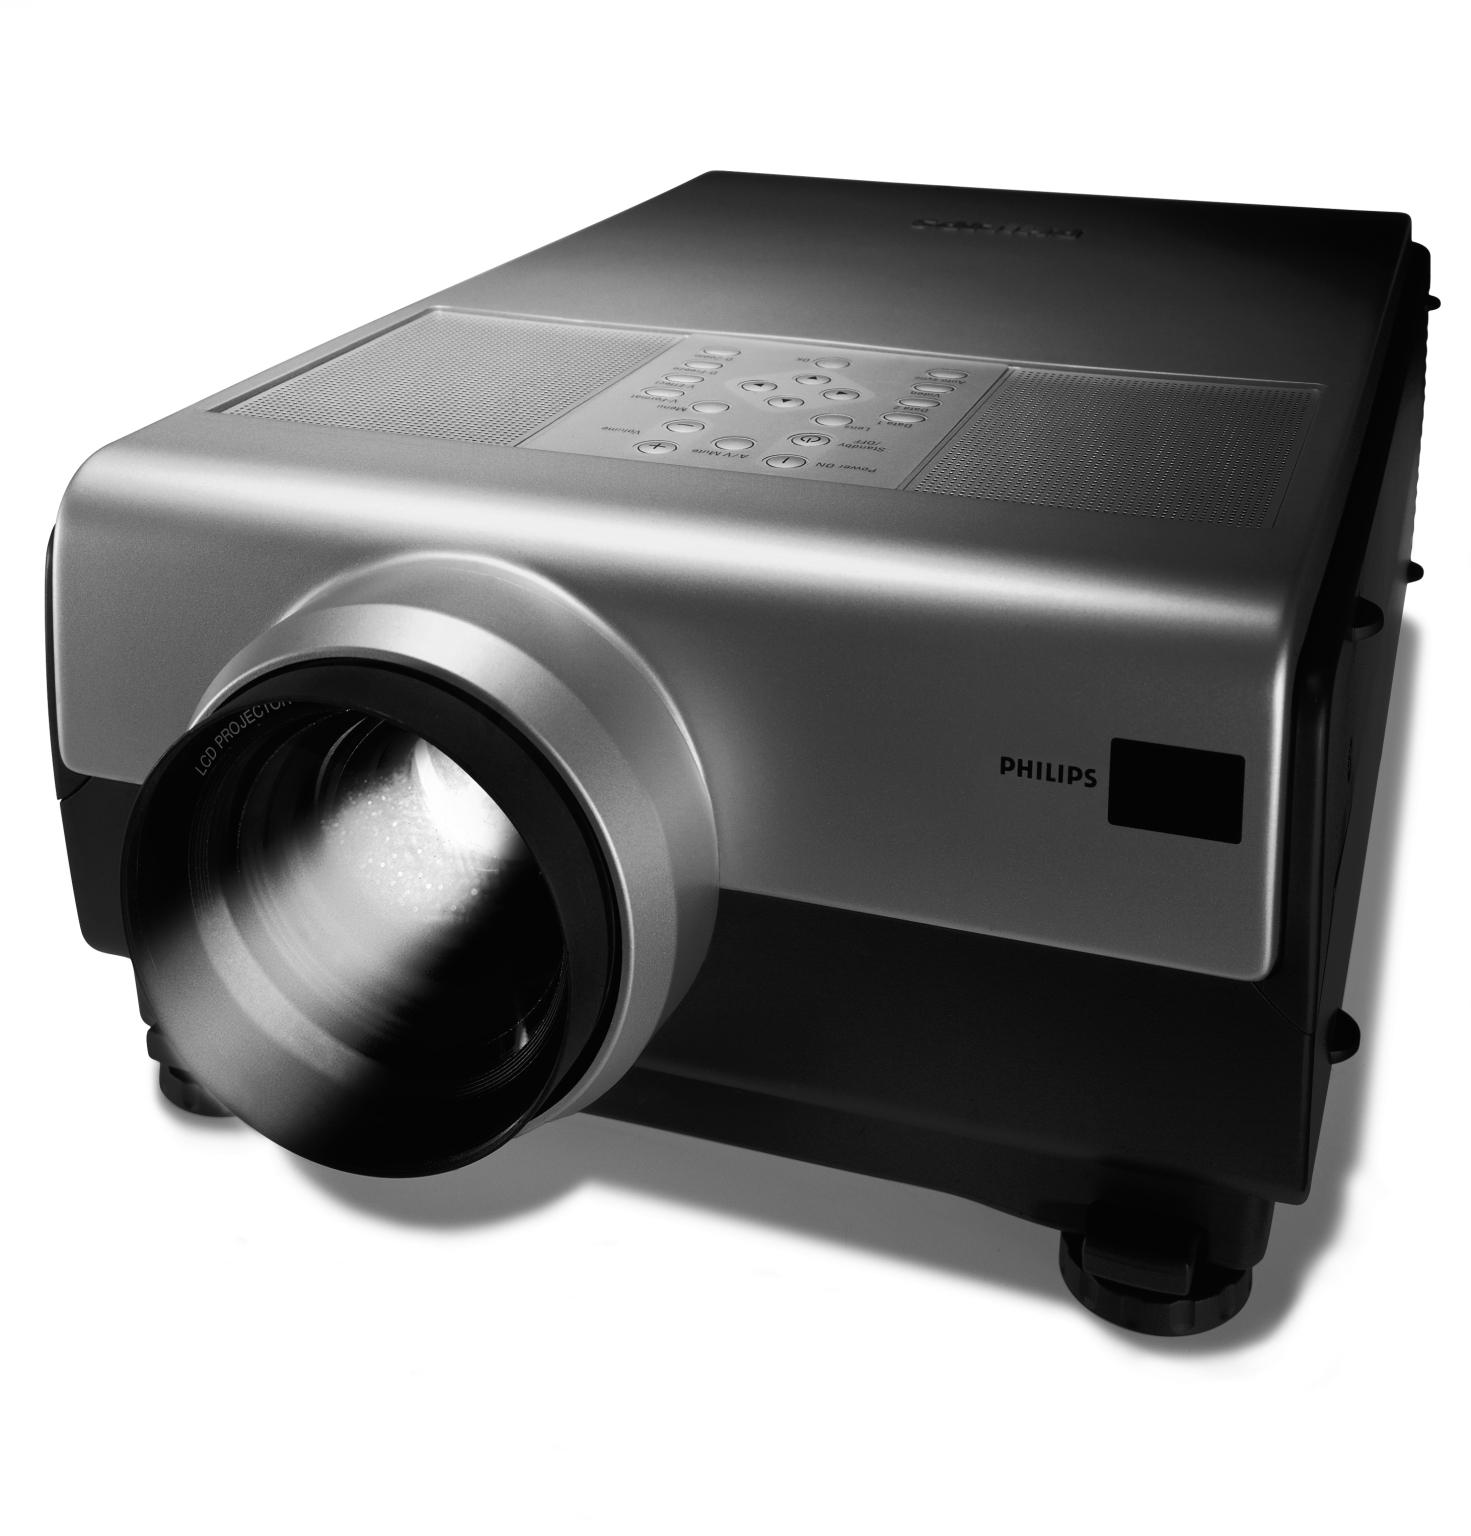 philips projektoren philips pxg20 xga lcd beamer. Black Bedroom Furniture Sets. Home Design Ideas